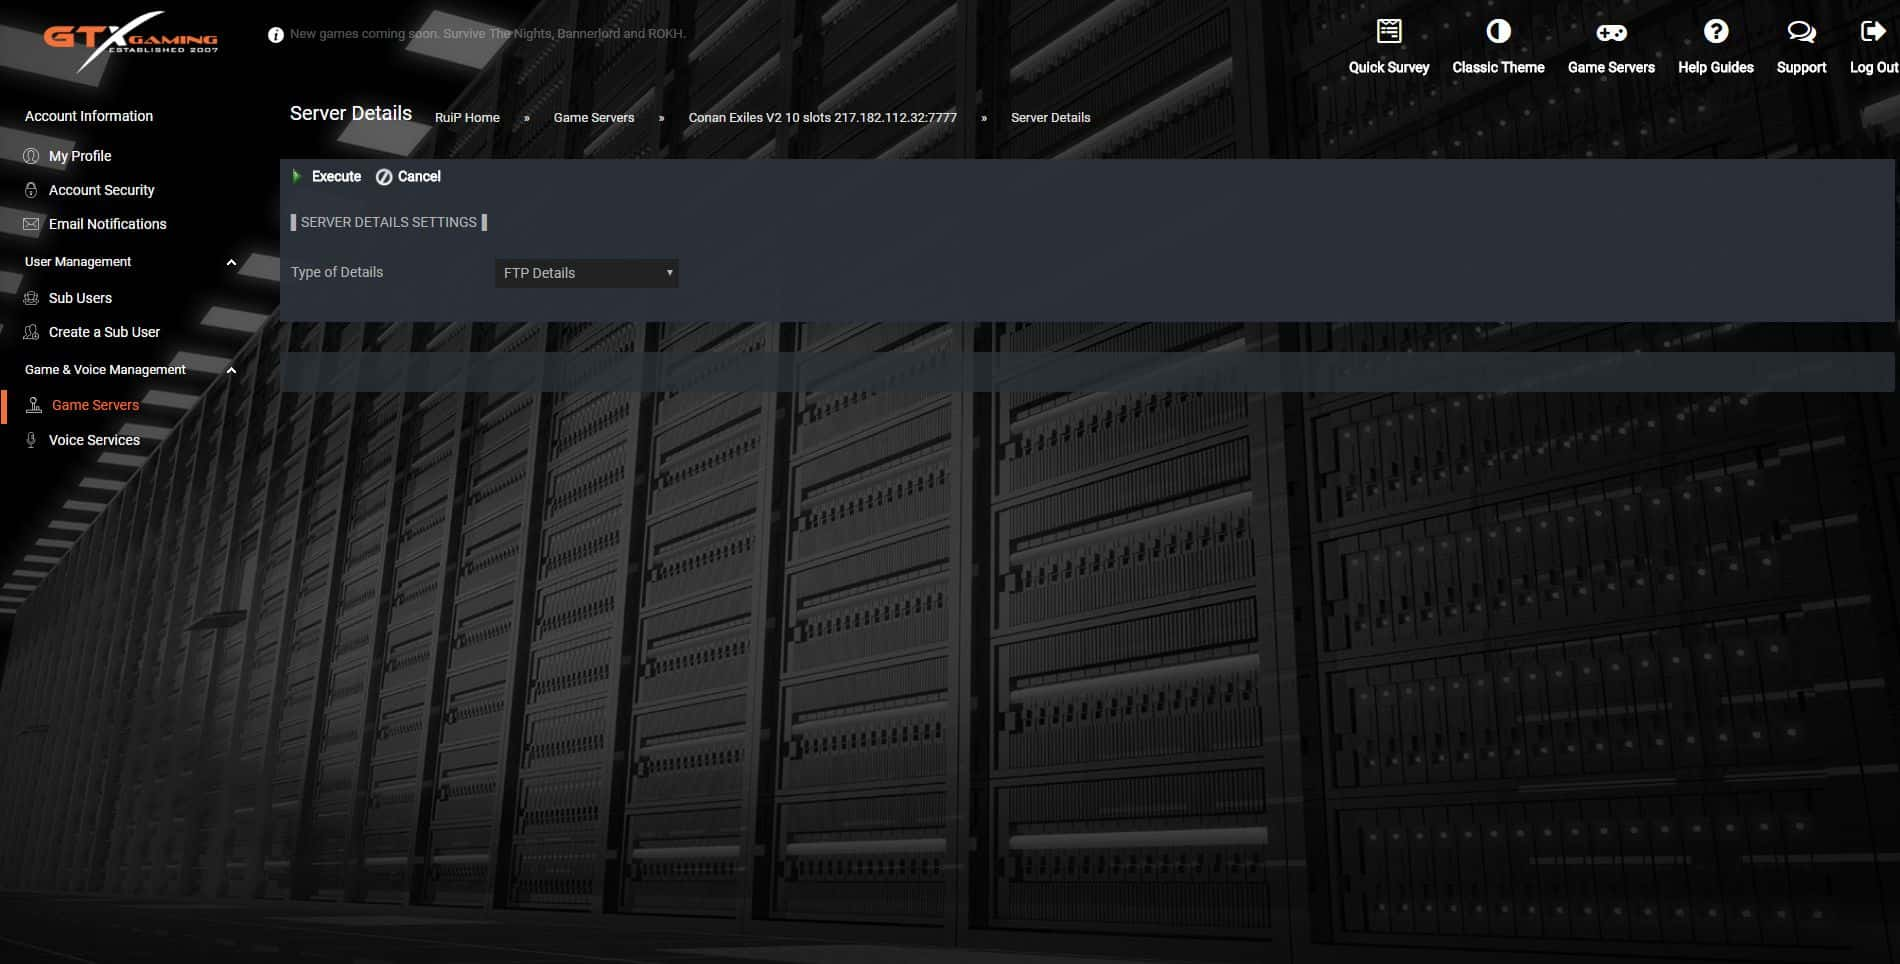 Quick Server Details